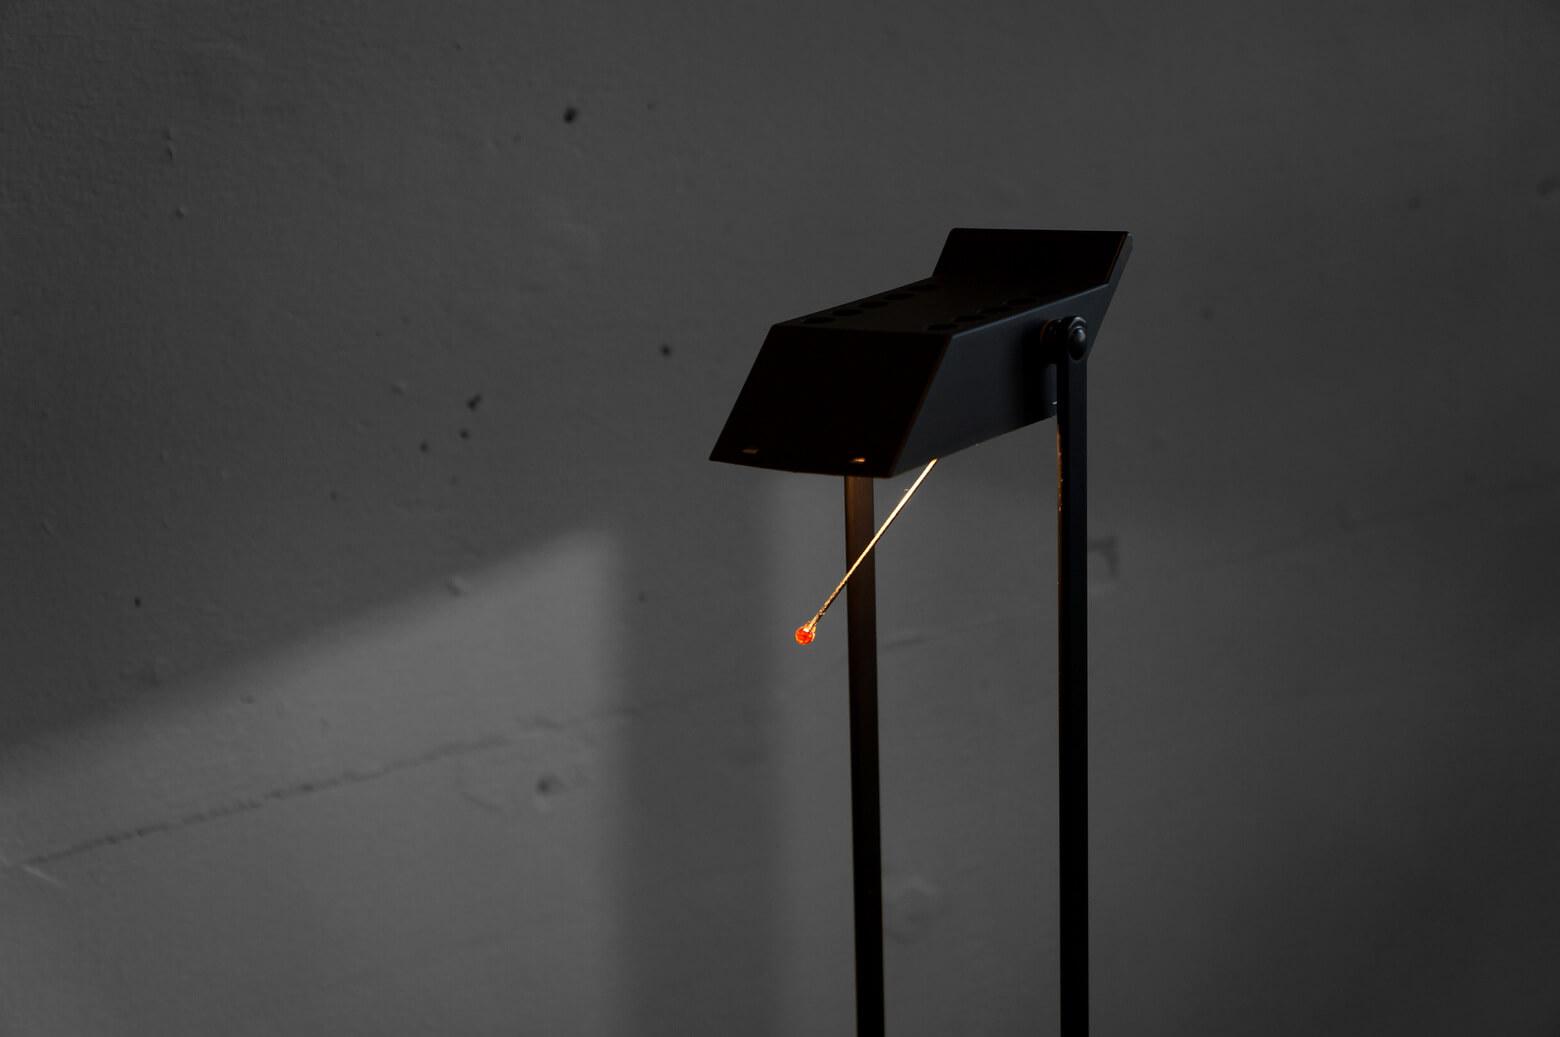 Artemide Desk Light TIZIO 35/アルテミデ デスクライト ティチオ 35